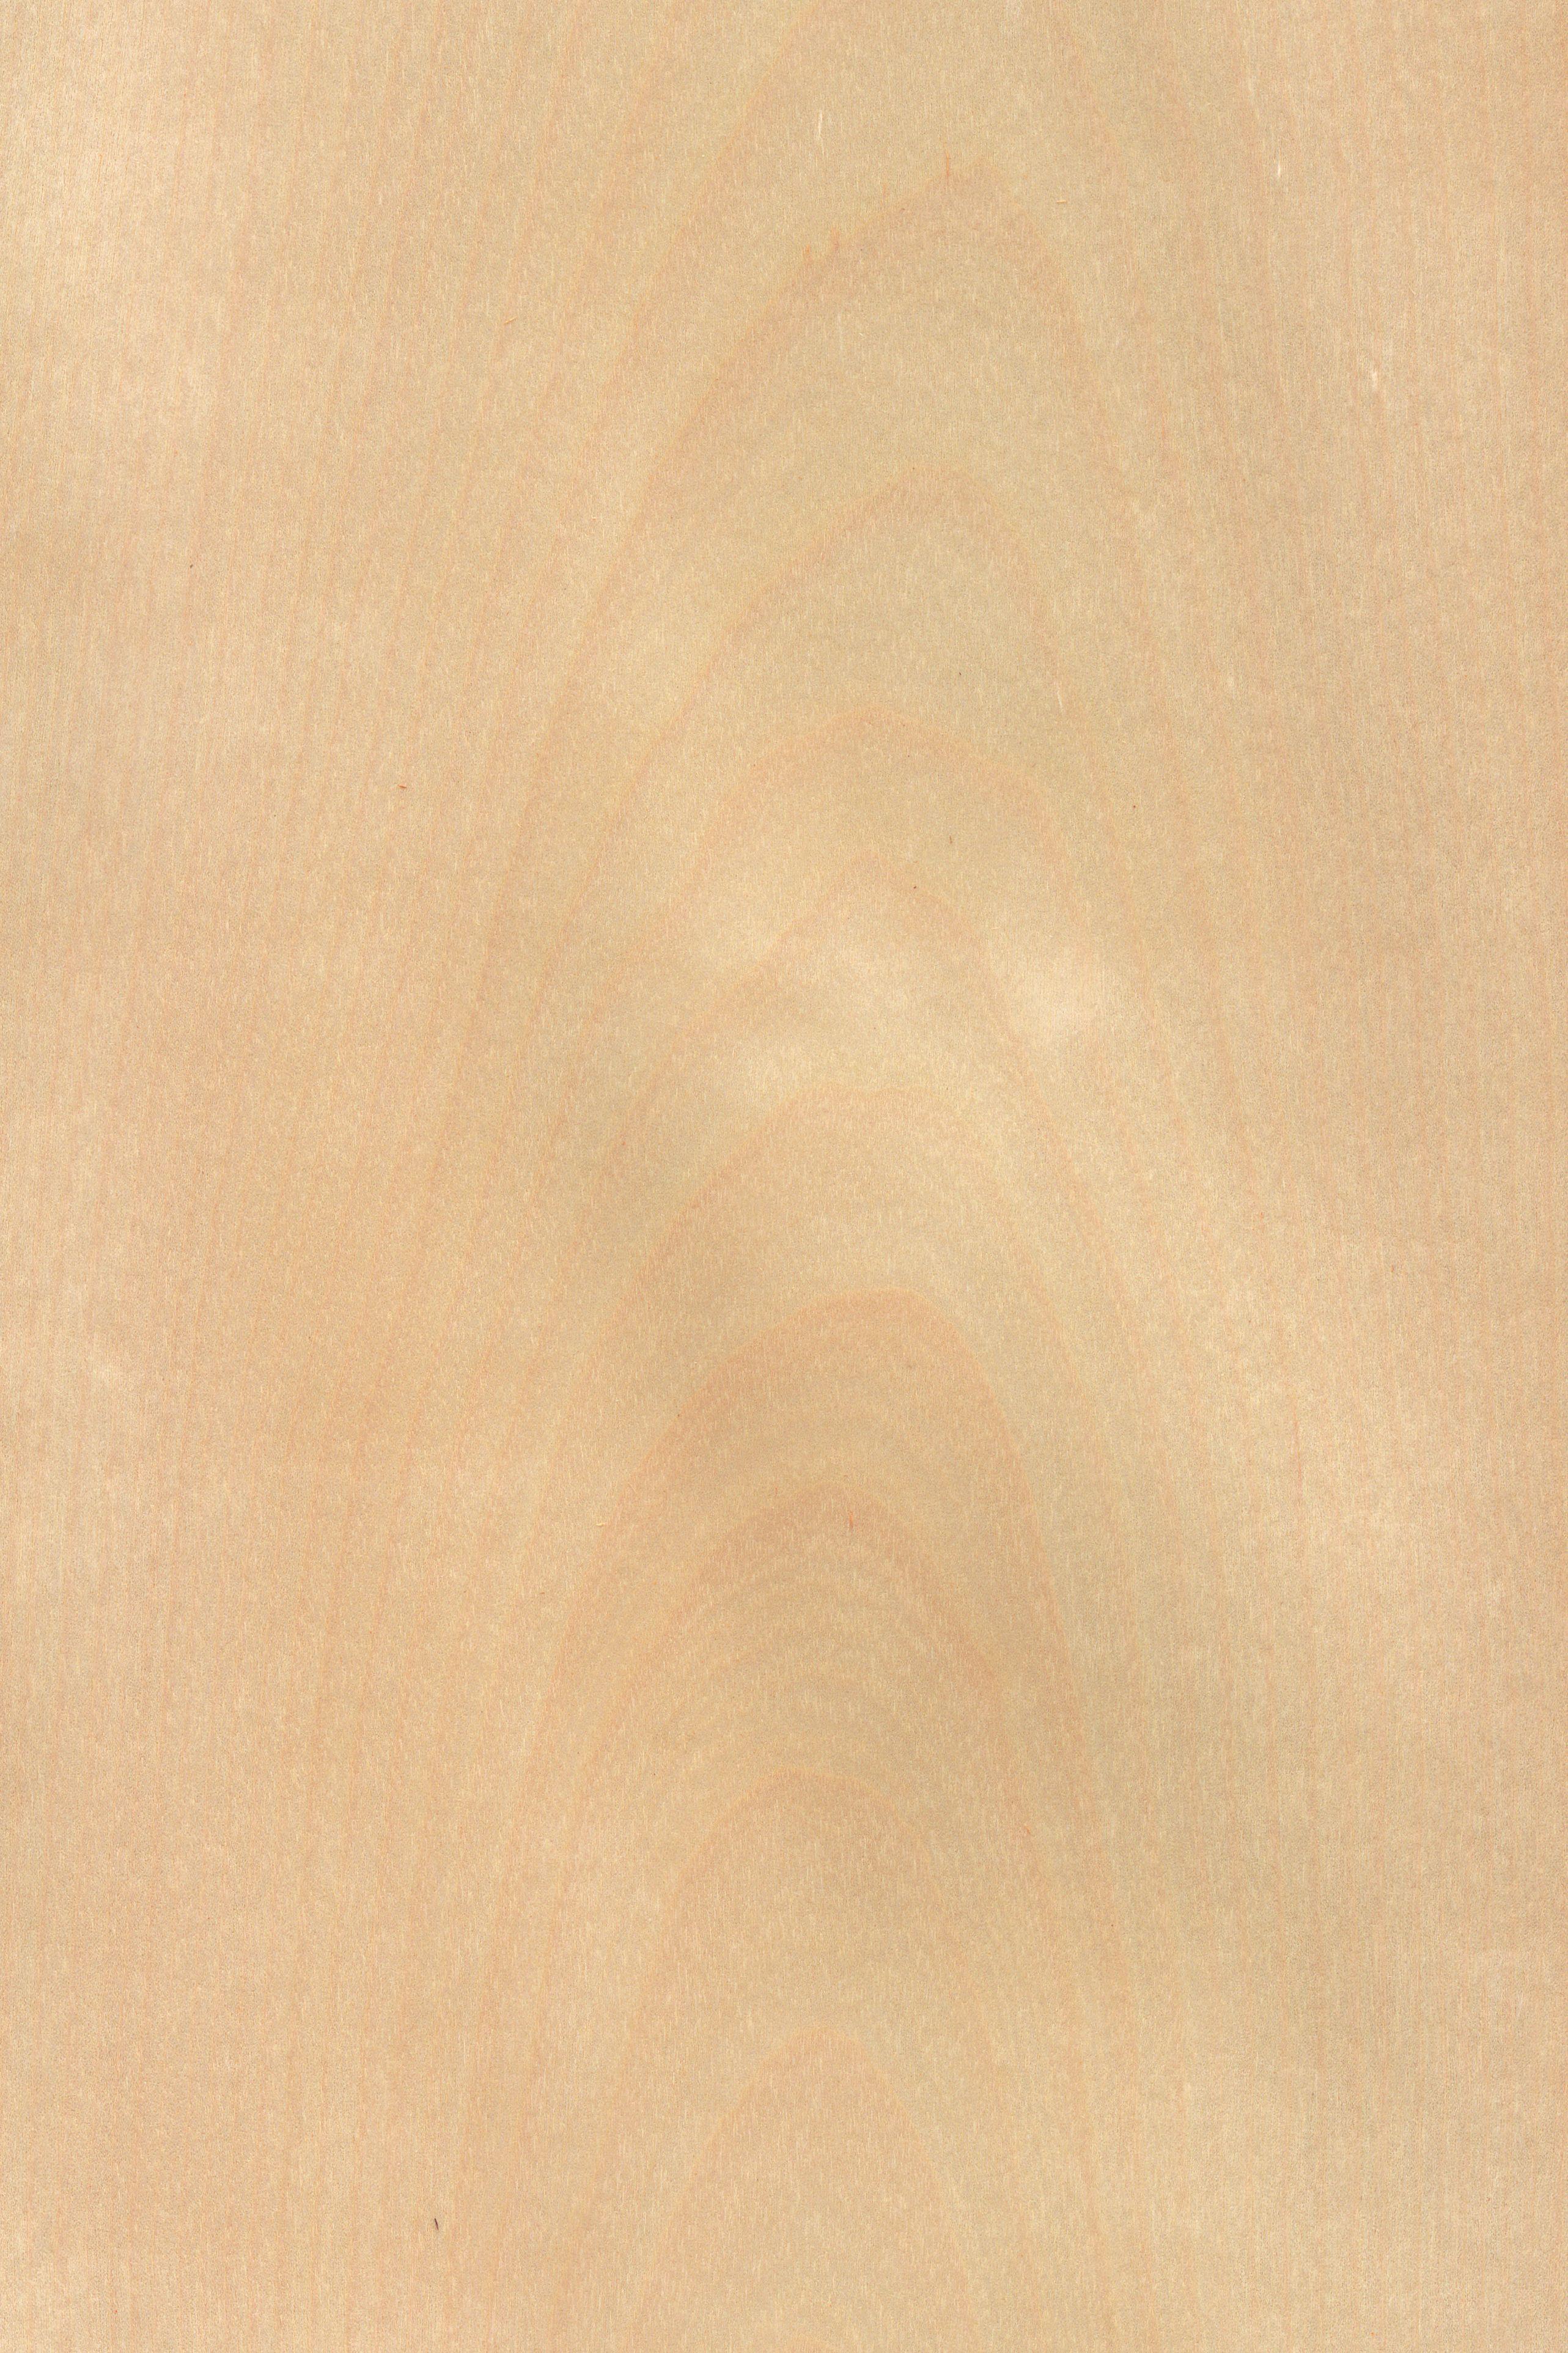 Birke | Furnier: Holzart, Birke, Blatt, Hell, Rosa, Laubholz #Holzarten  #Furniere #Holz